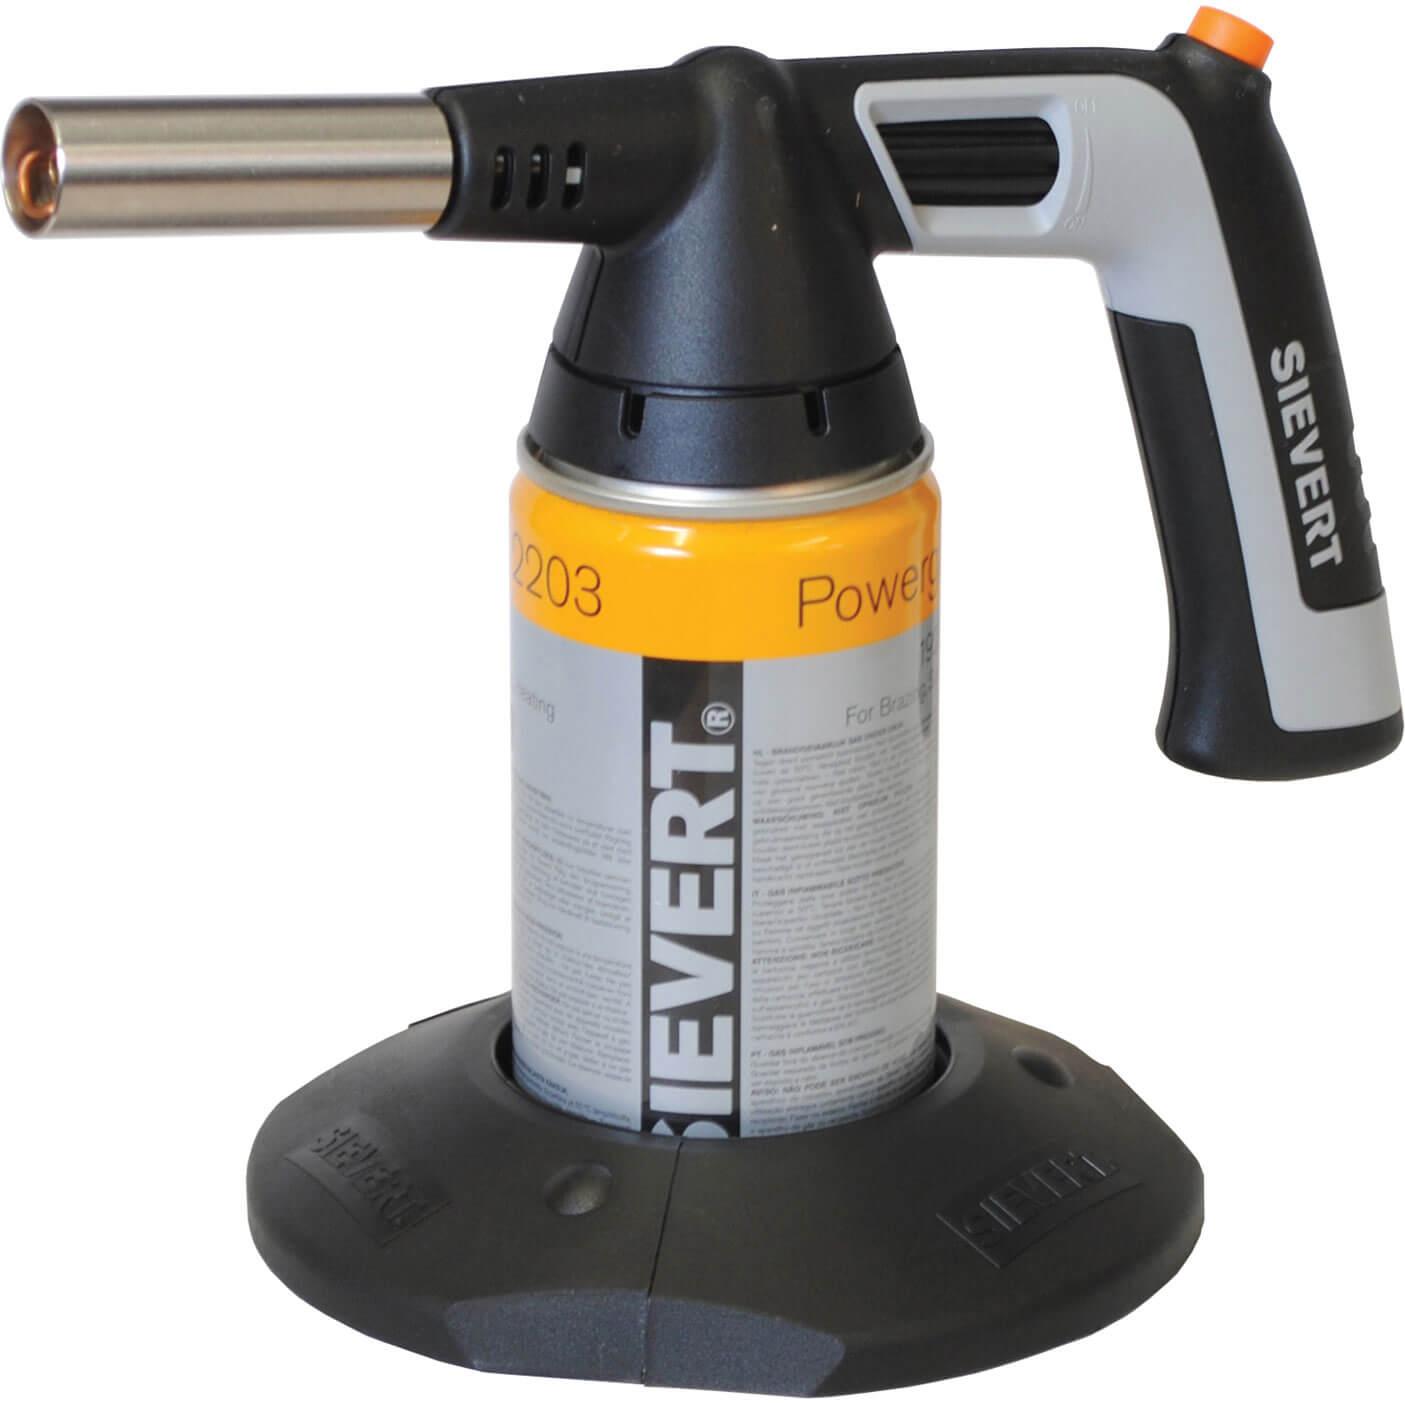 Image of Sievert 2282 Handyjet Blowtorch Kit